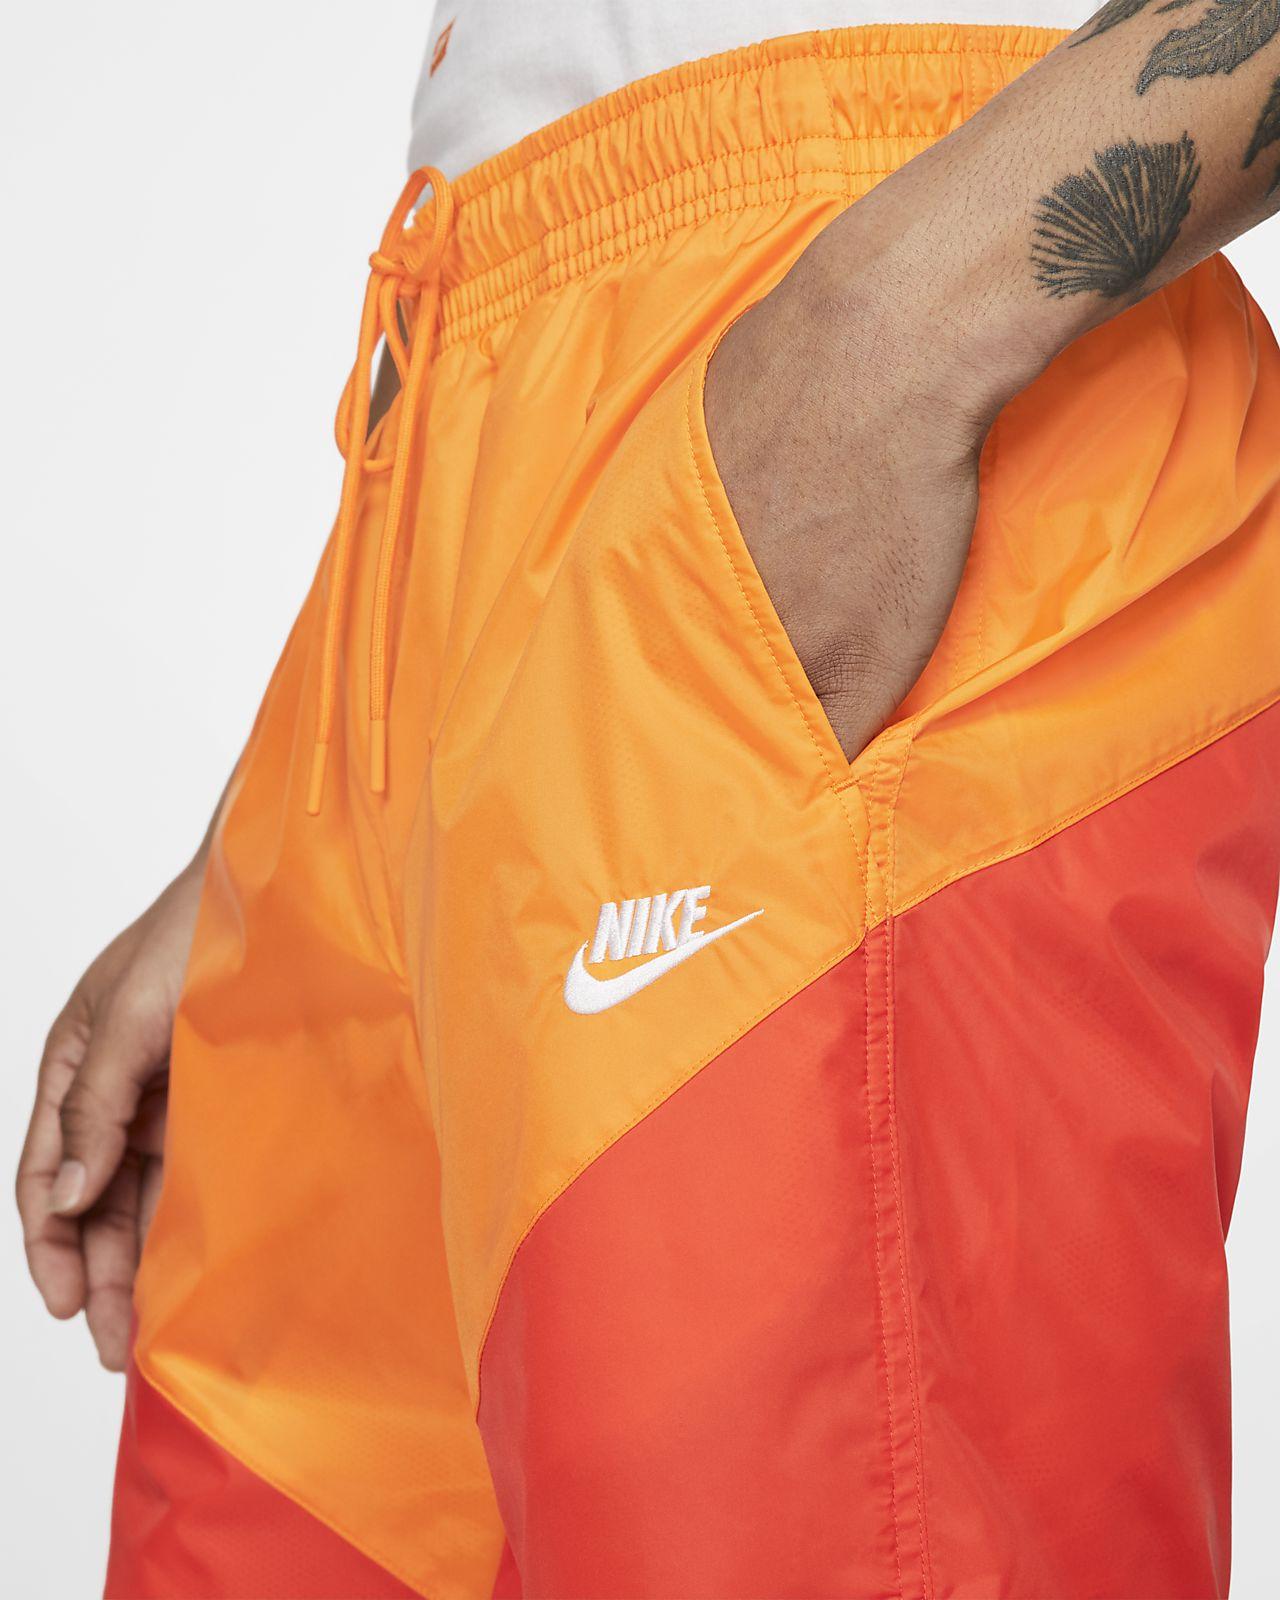 4d15bc876e20 Nike Sportswear Windrunner Men s Track Shorts. Nike.com